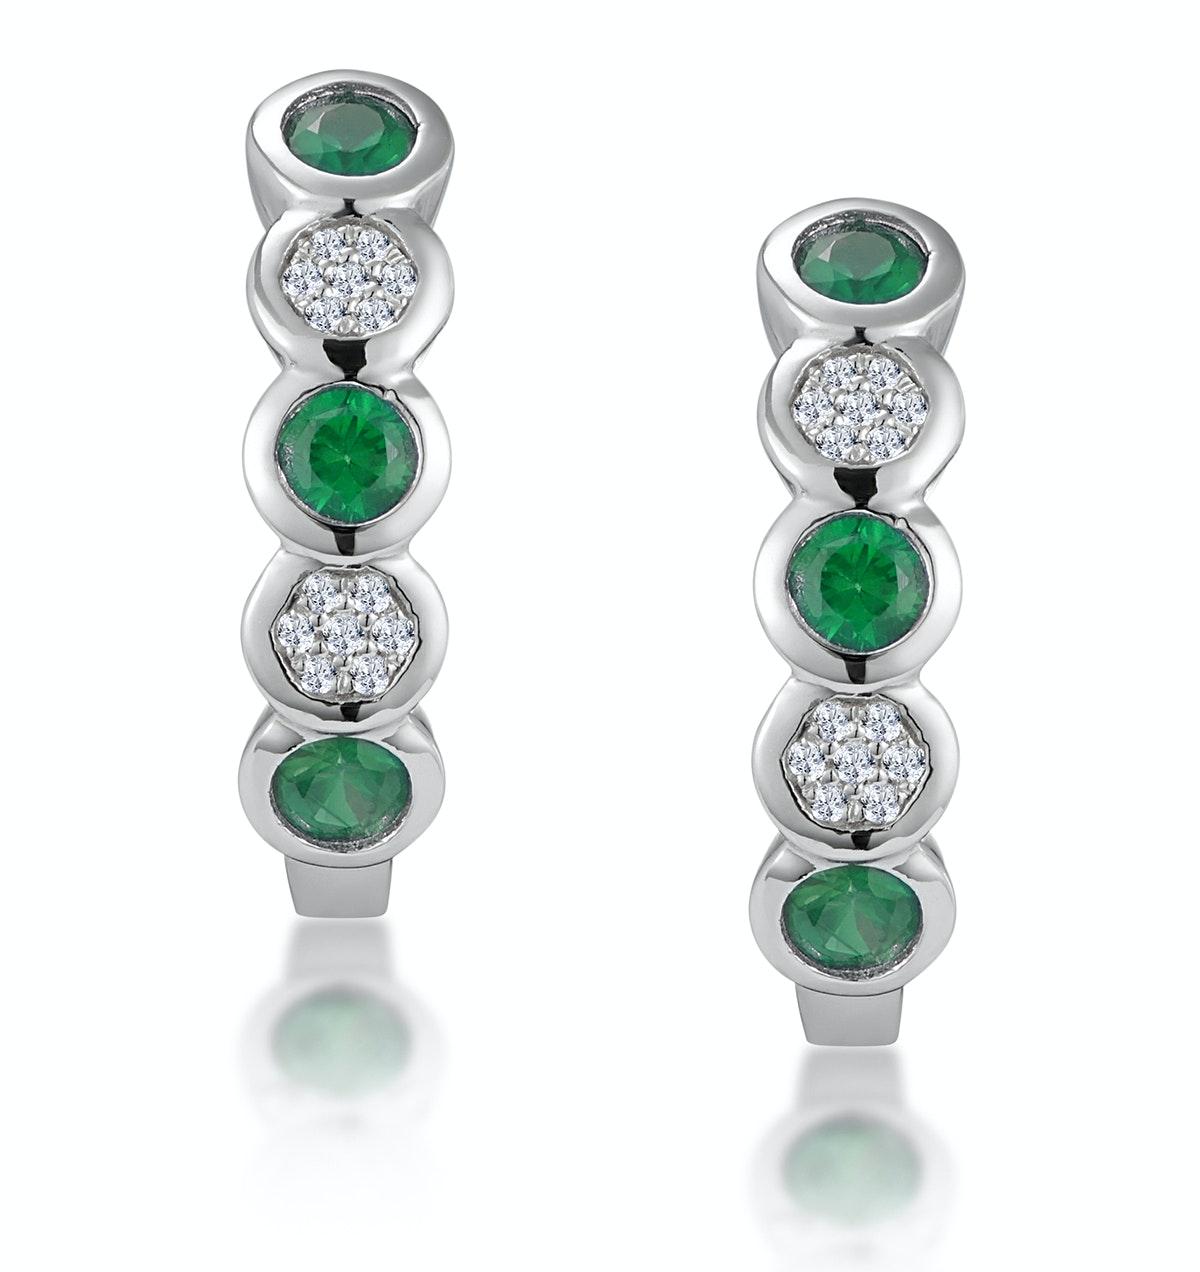 Stellato Emerald and Diamond Eternity Earrings in 9K White Gold